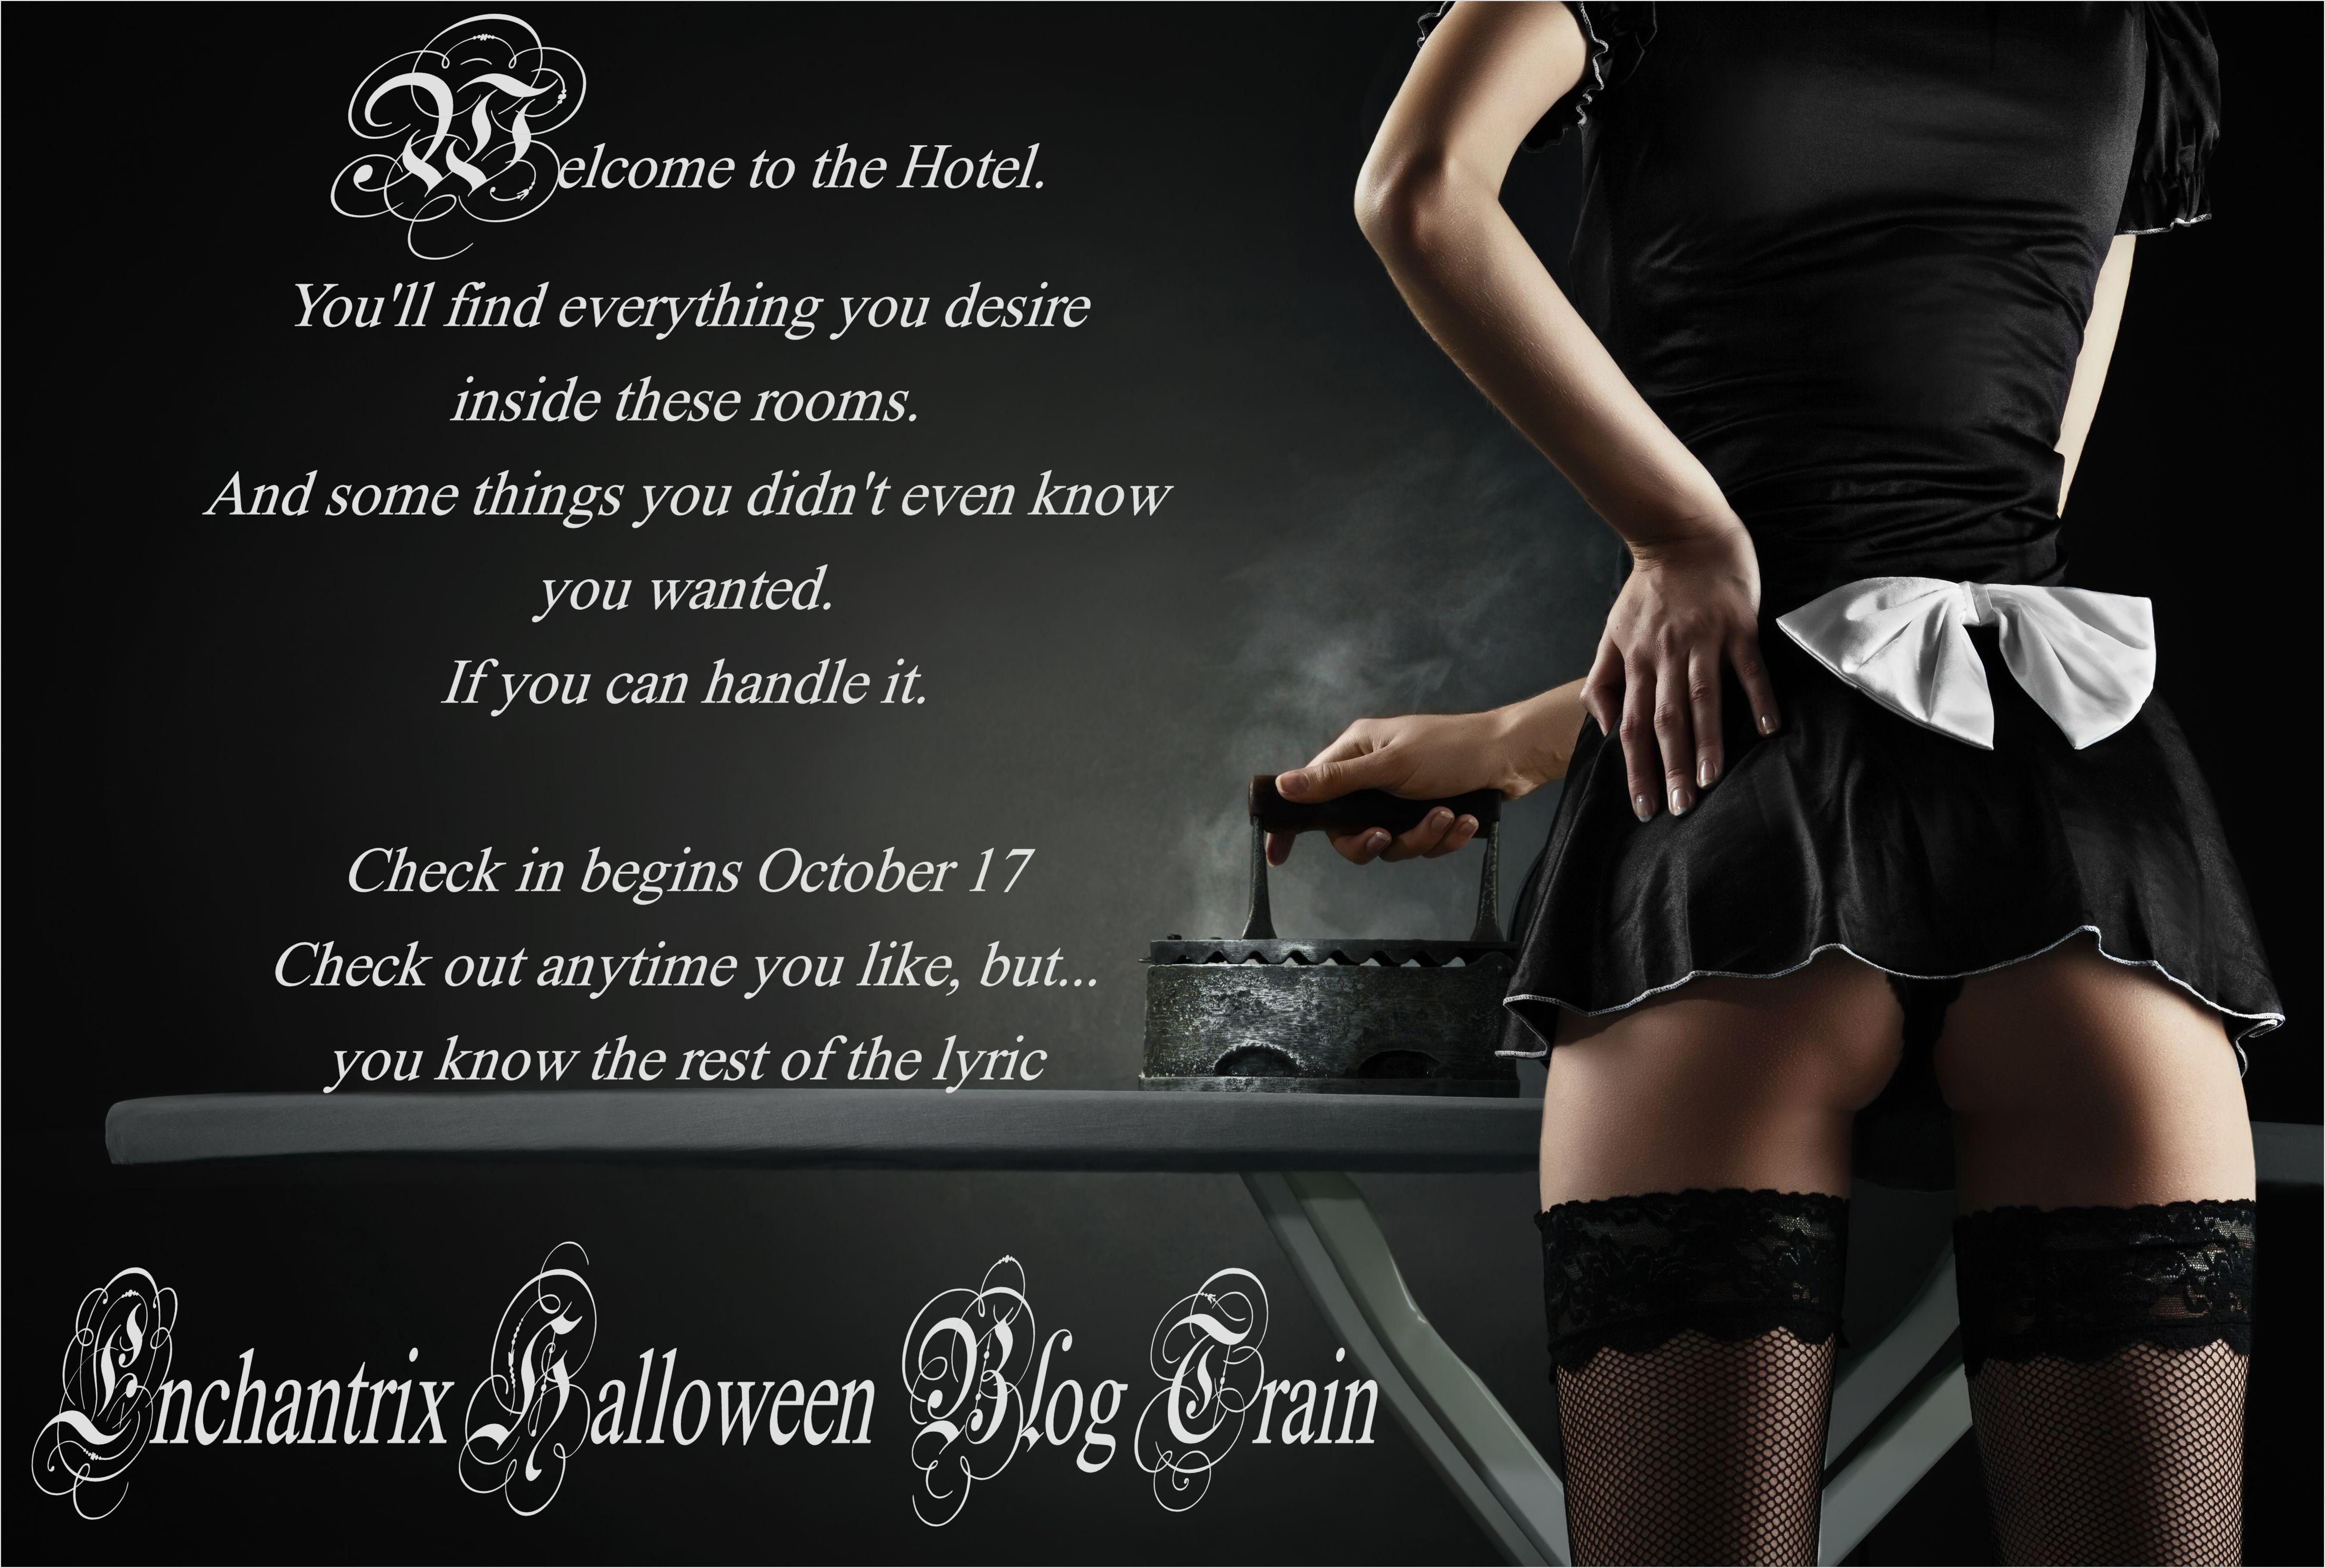 halloween blog train